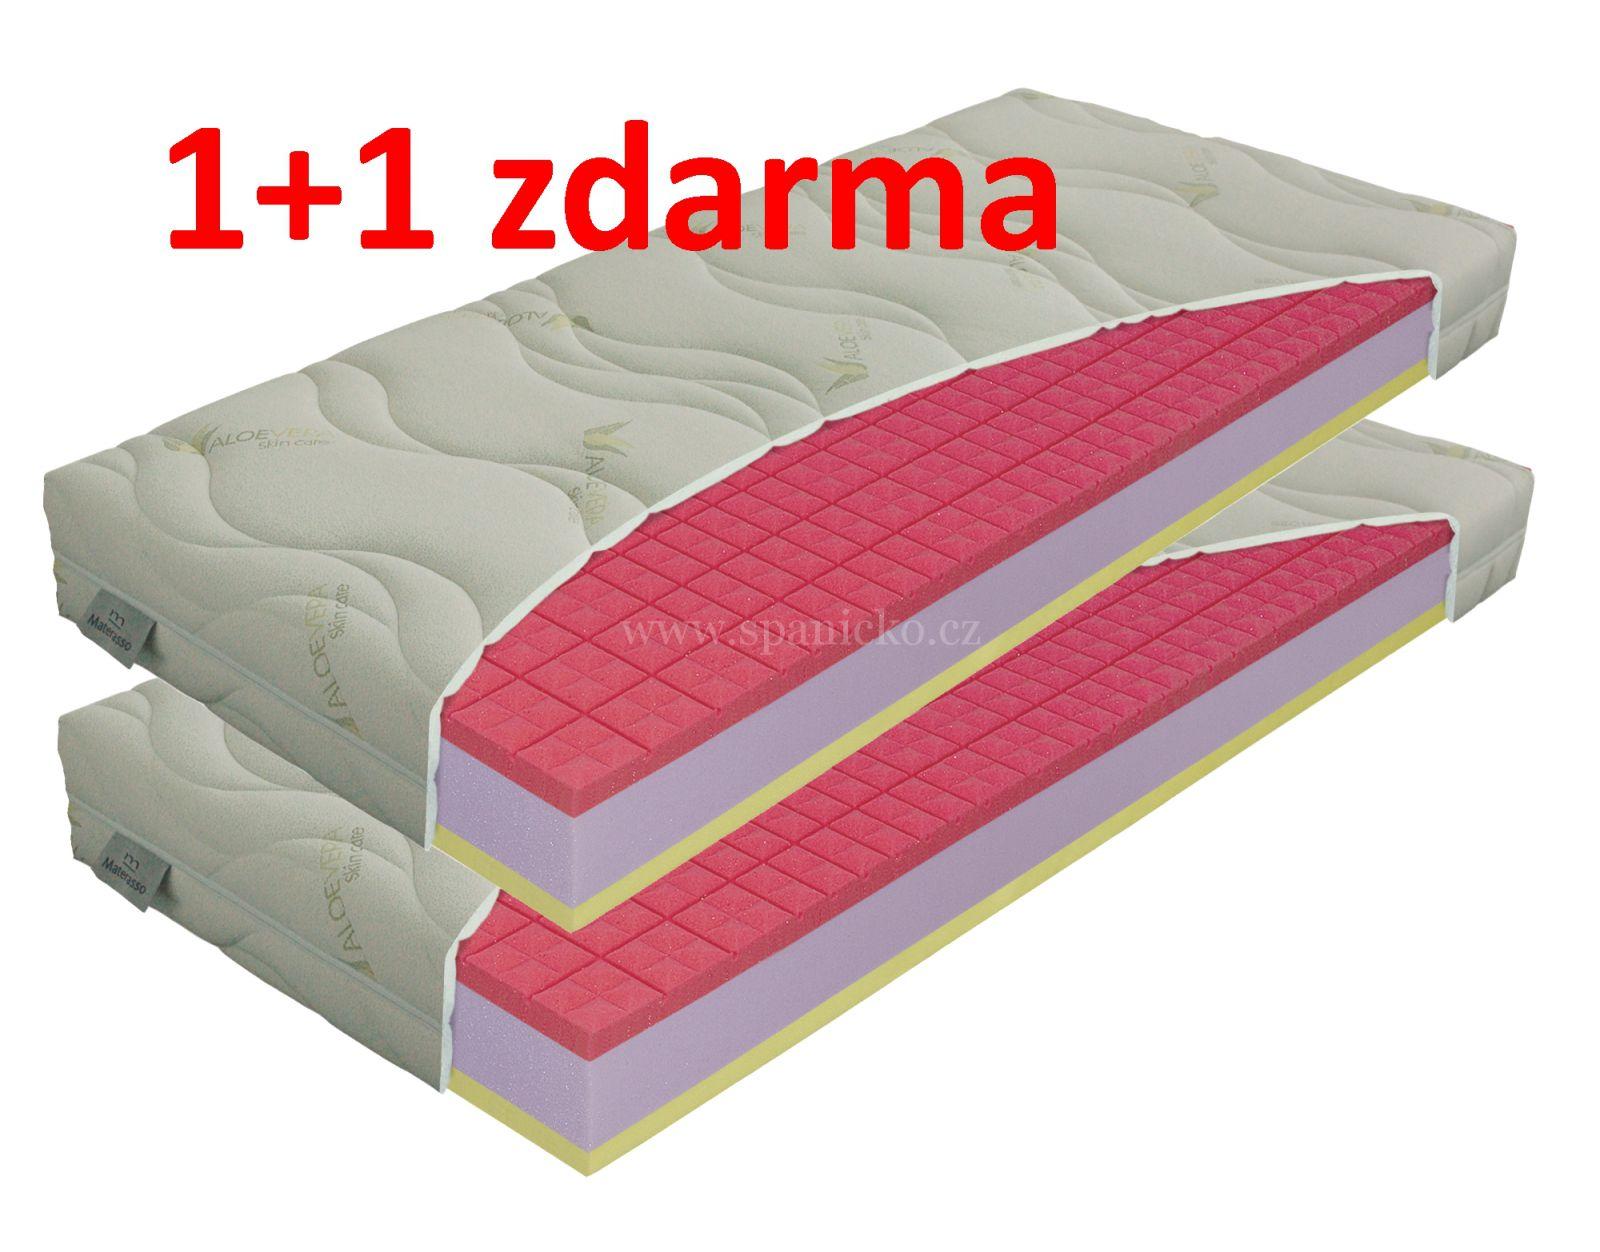 matrace ANTIBACTERIAL visco vakuo 22cm / 1+1 zdarma /+dárek MATERASSO